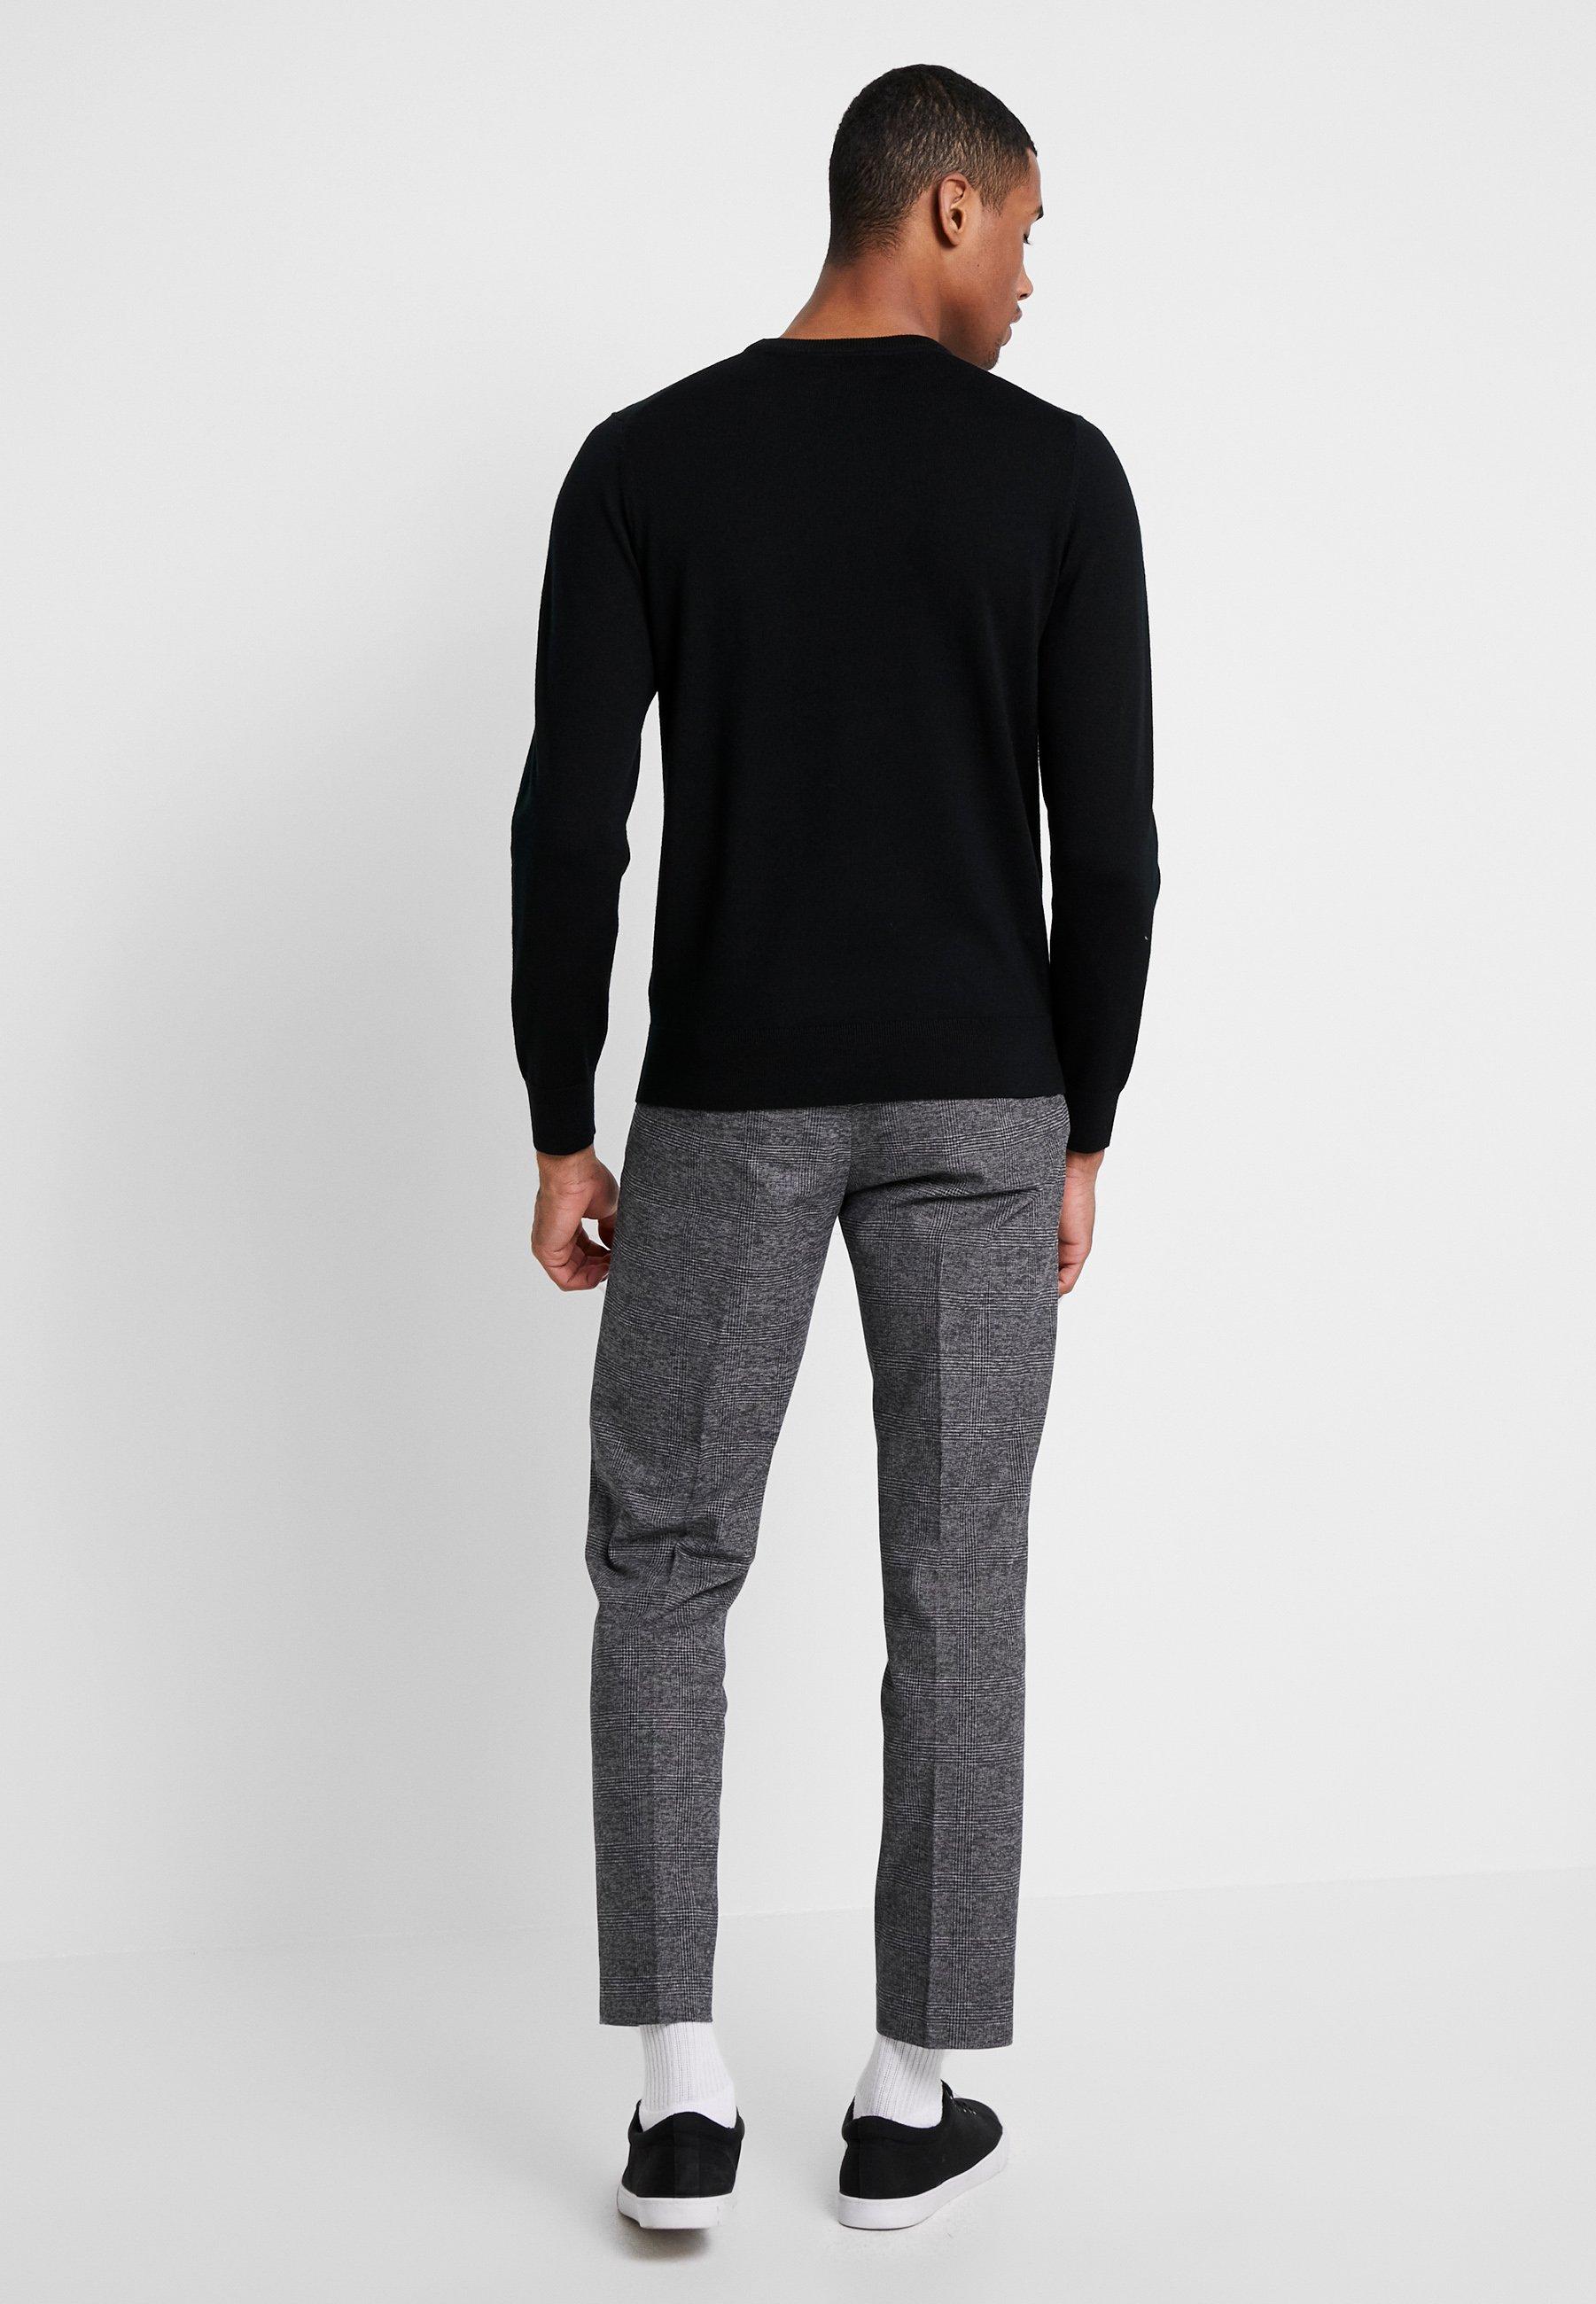 Fit PantPantalon Check Calvin Klein Tapered Classique Black On80wPk